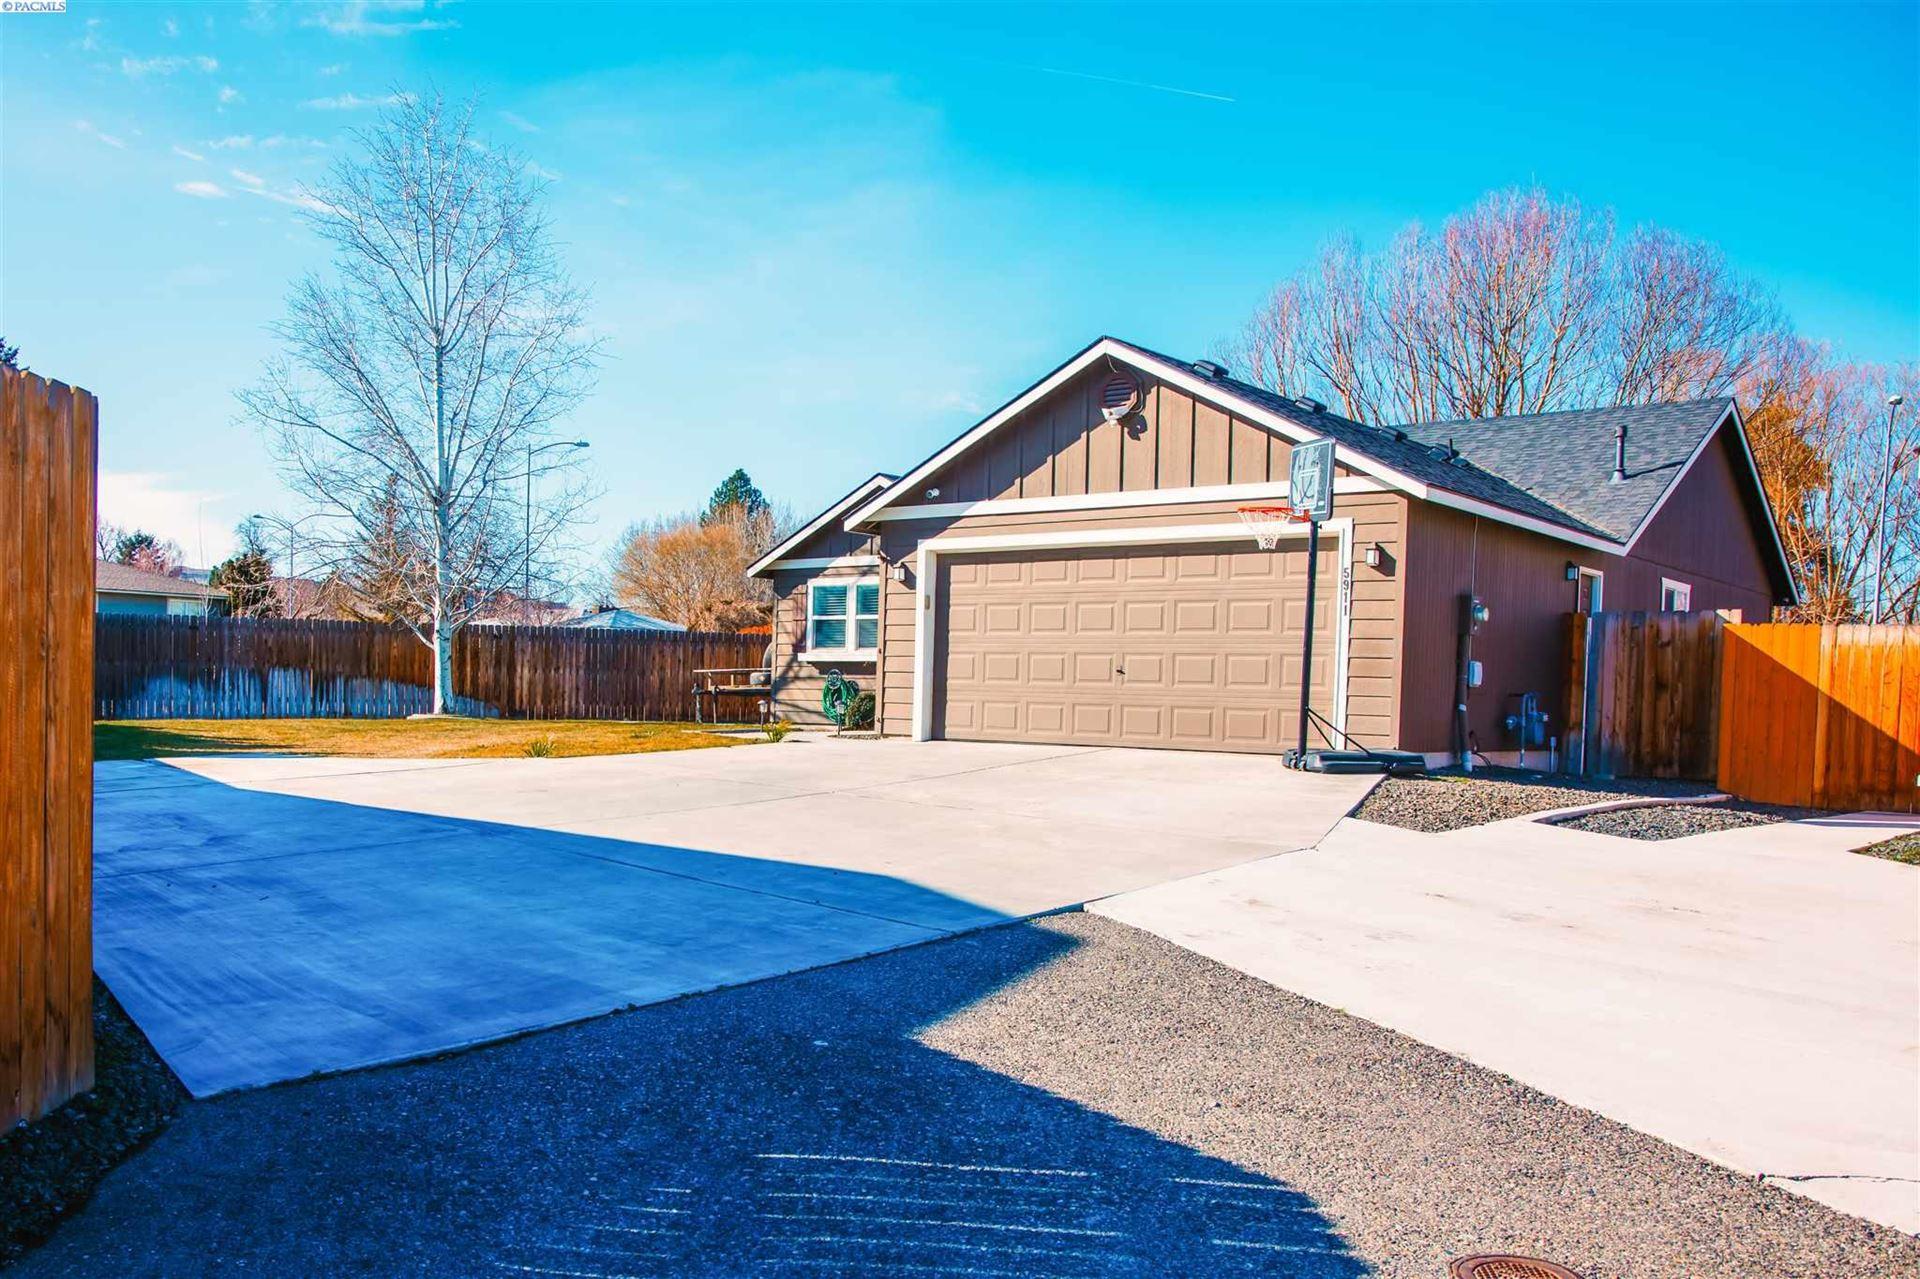 Photo of 5911 W 4th Place, Kennewick, WA 99336 (MLS # 252032)